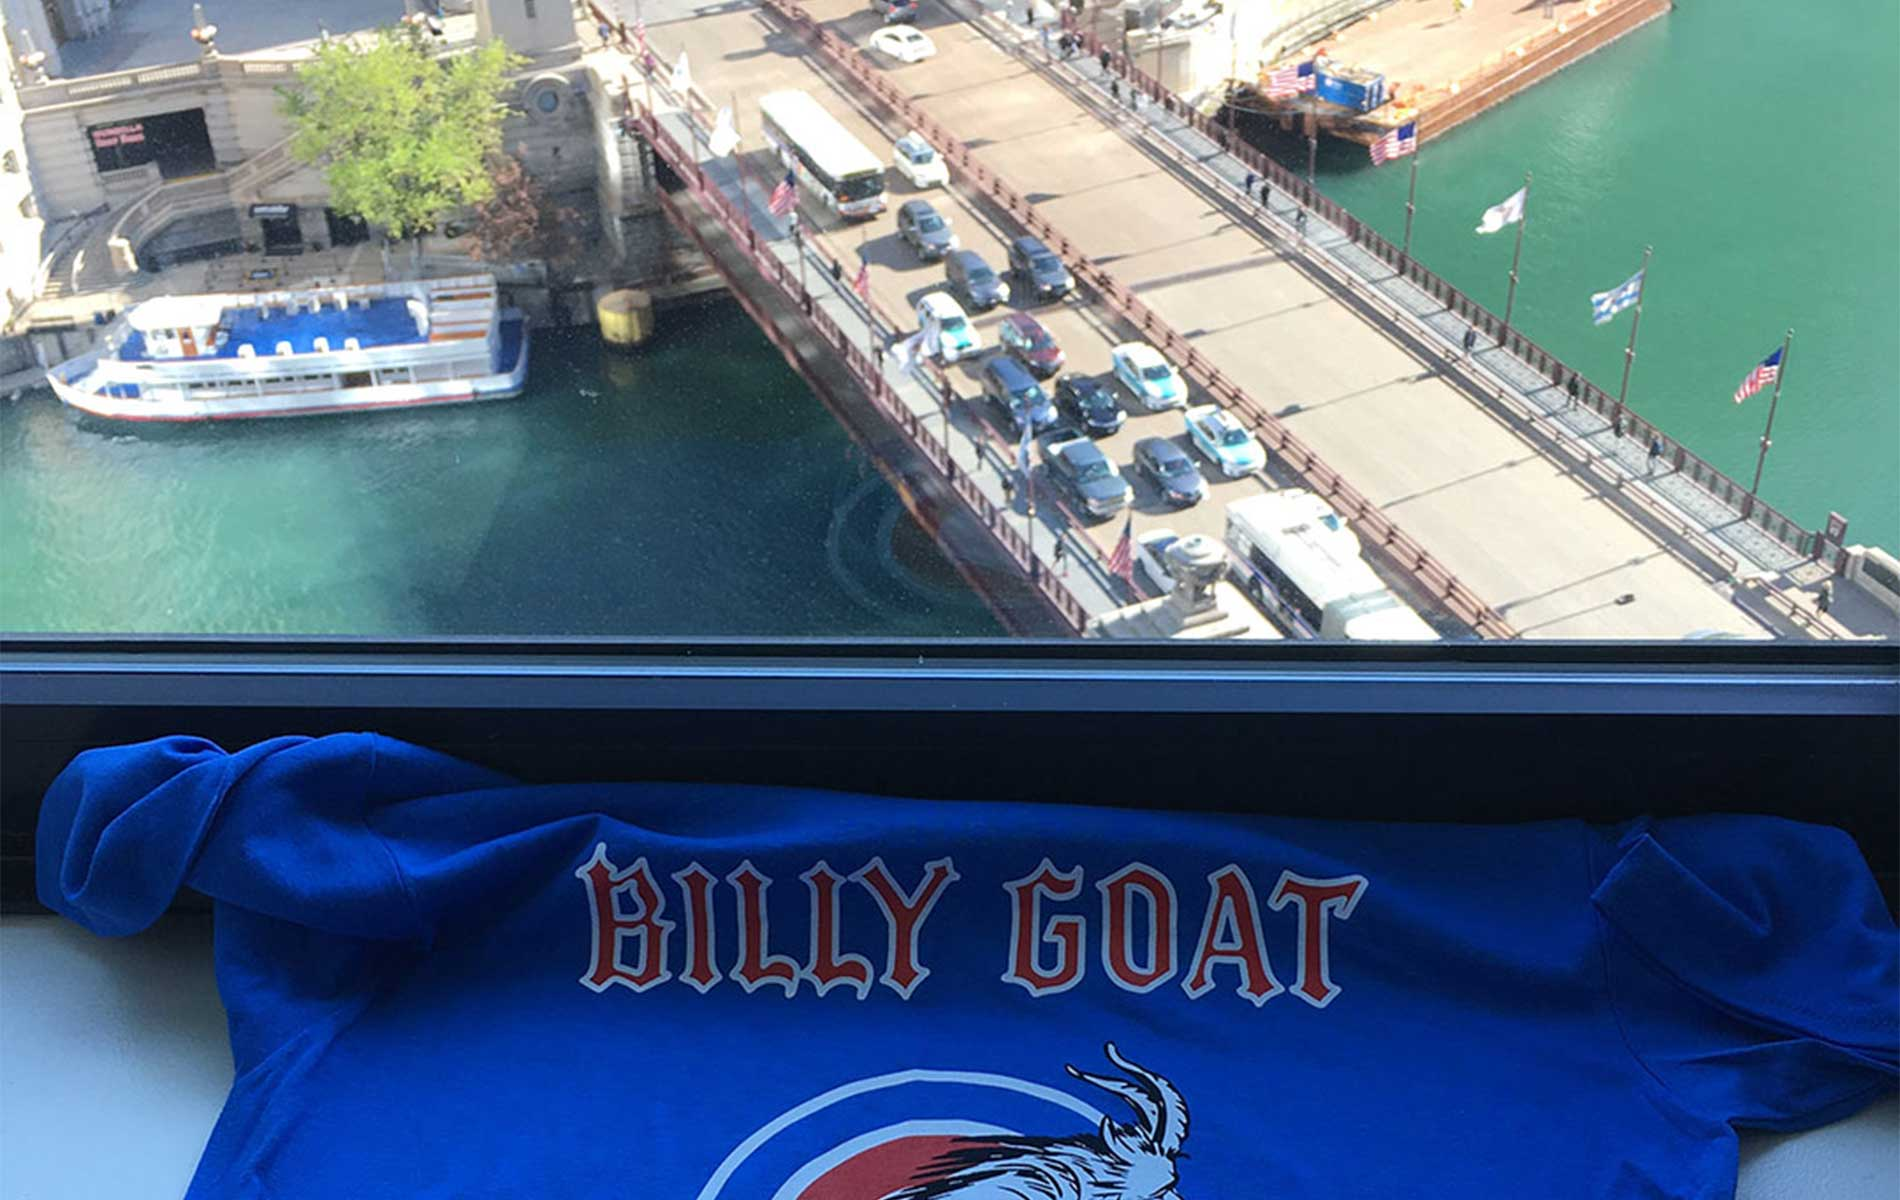 billy-goat-curse-tee